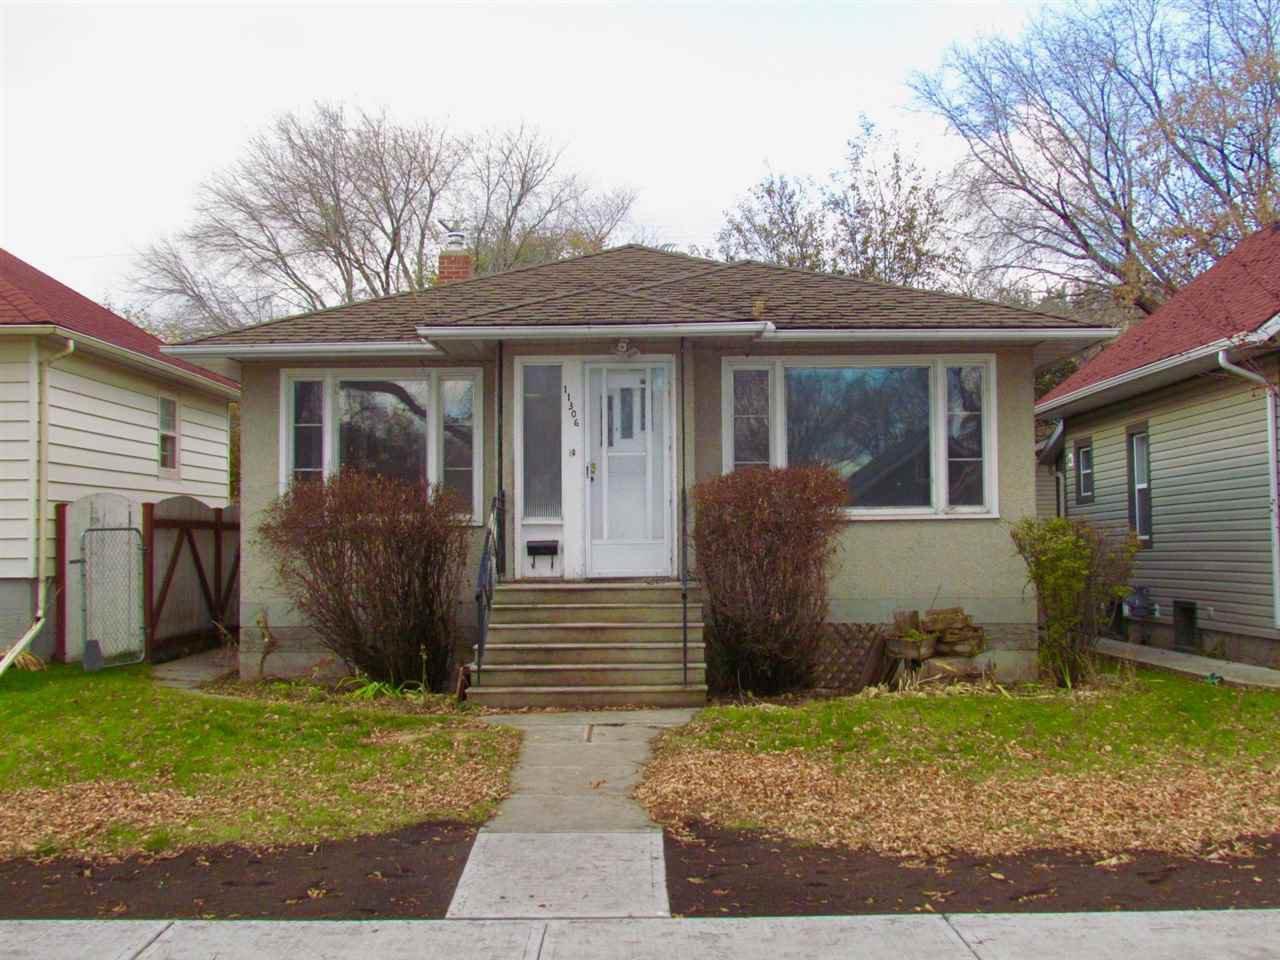 Main Photo: 11306 67 Street in Edmonton: Zone 09 House for sale : MLS®# E4178452